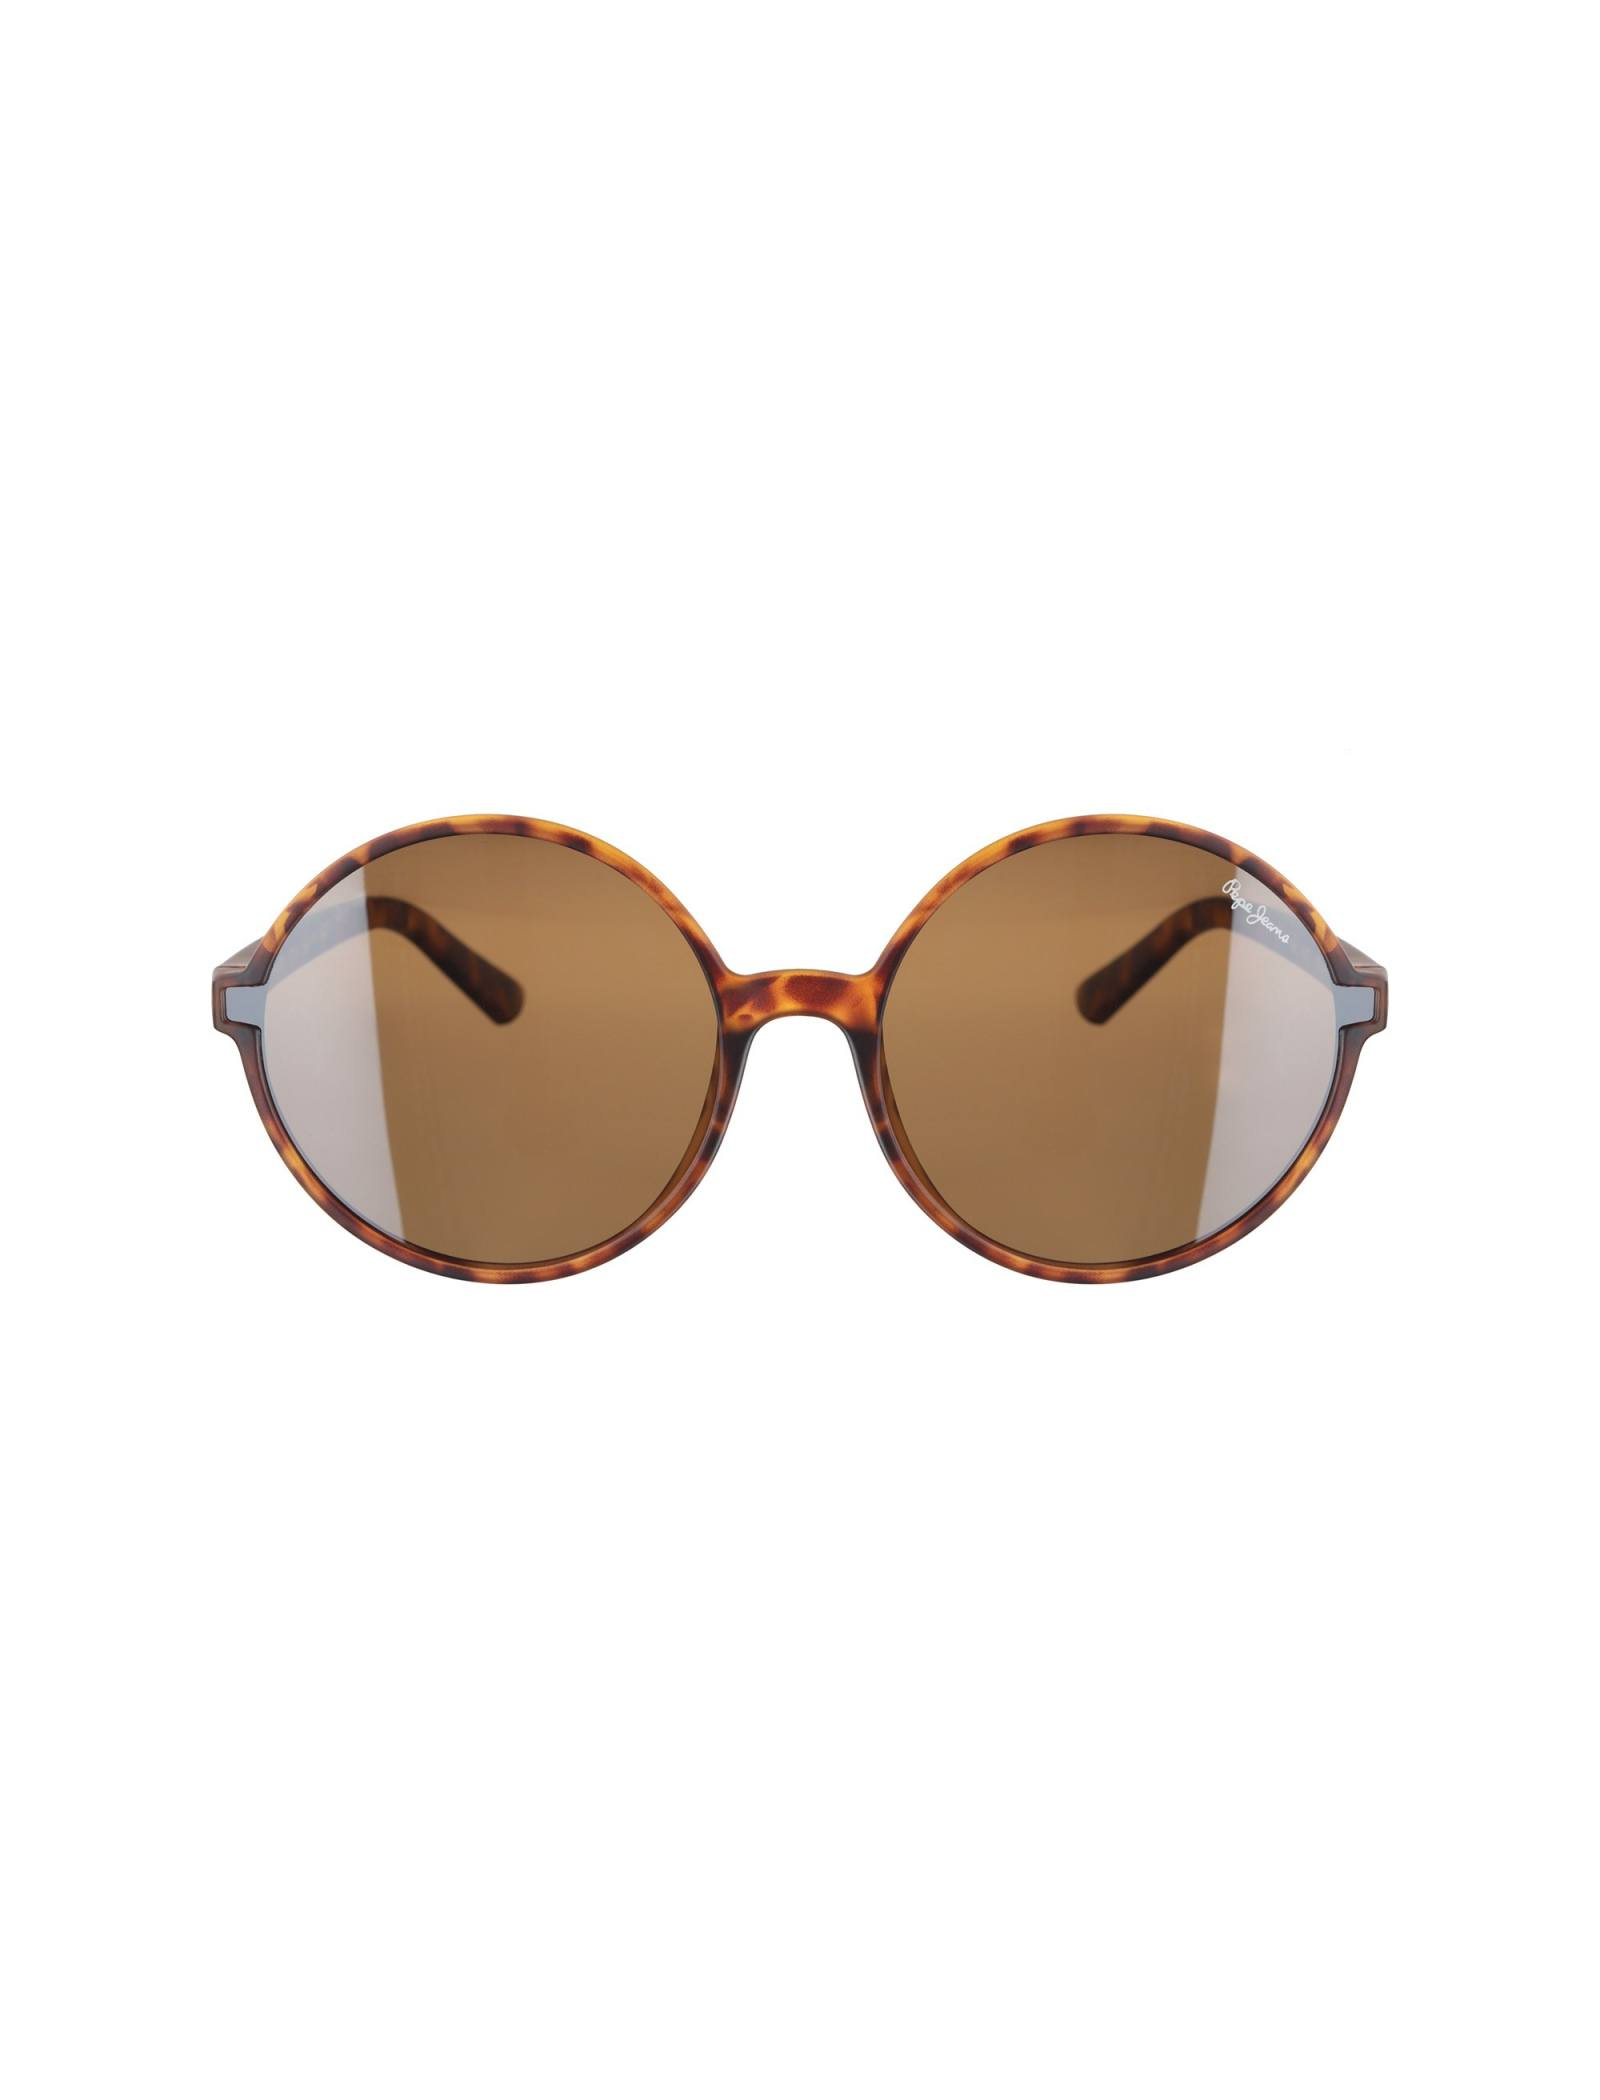 عینک آفتابی گرد زنانه - پپه جینز - قهوه اي  - 1